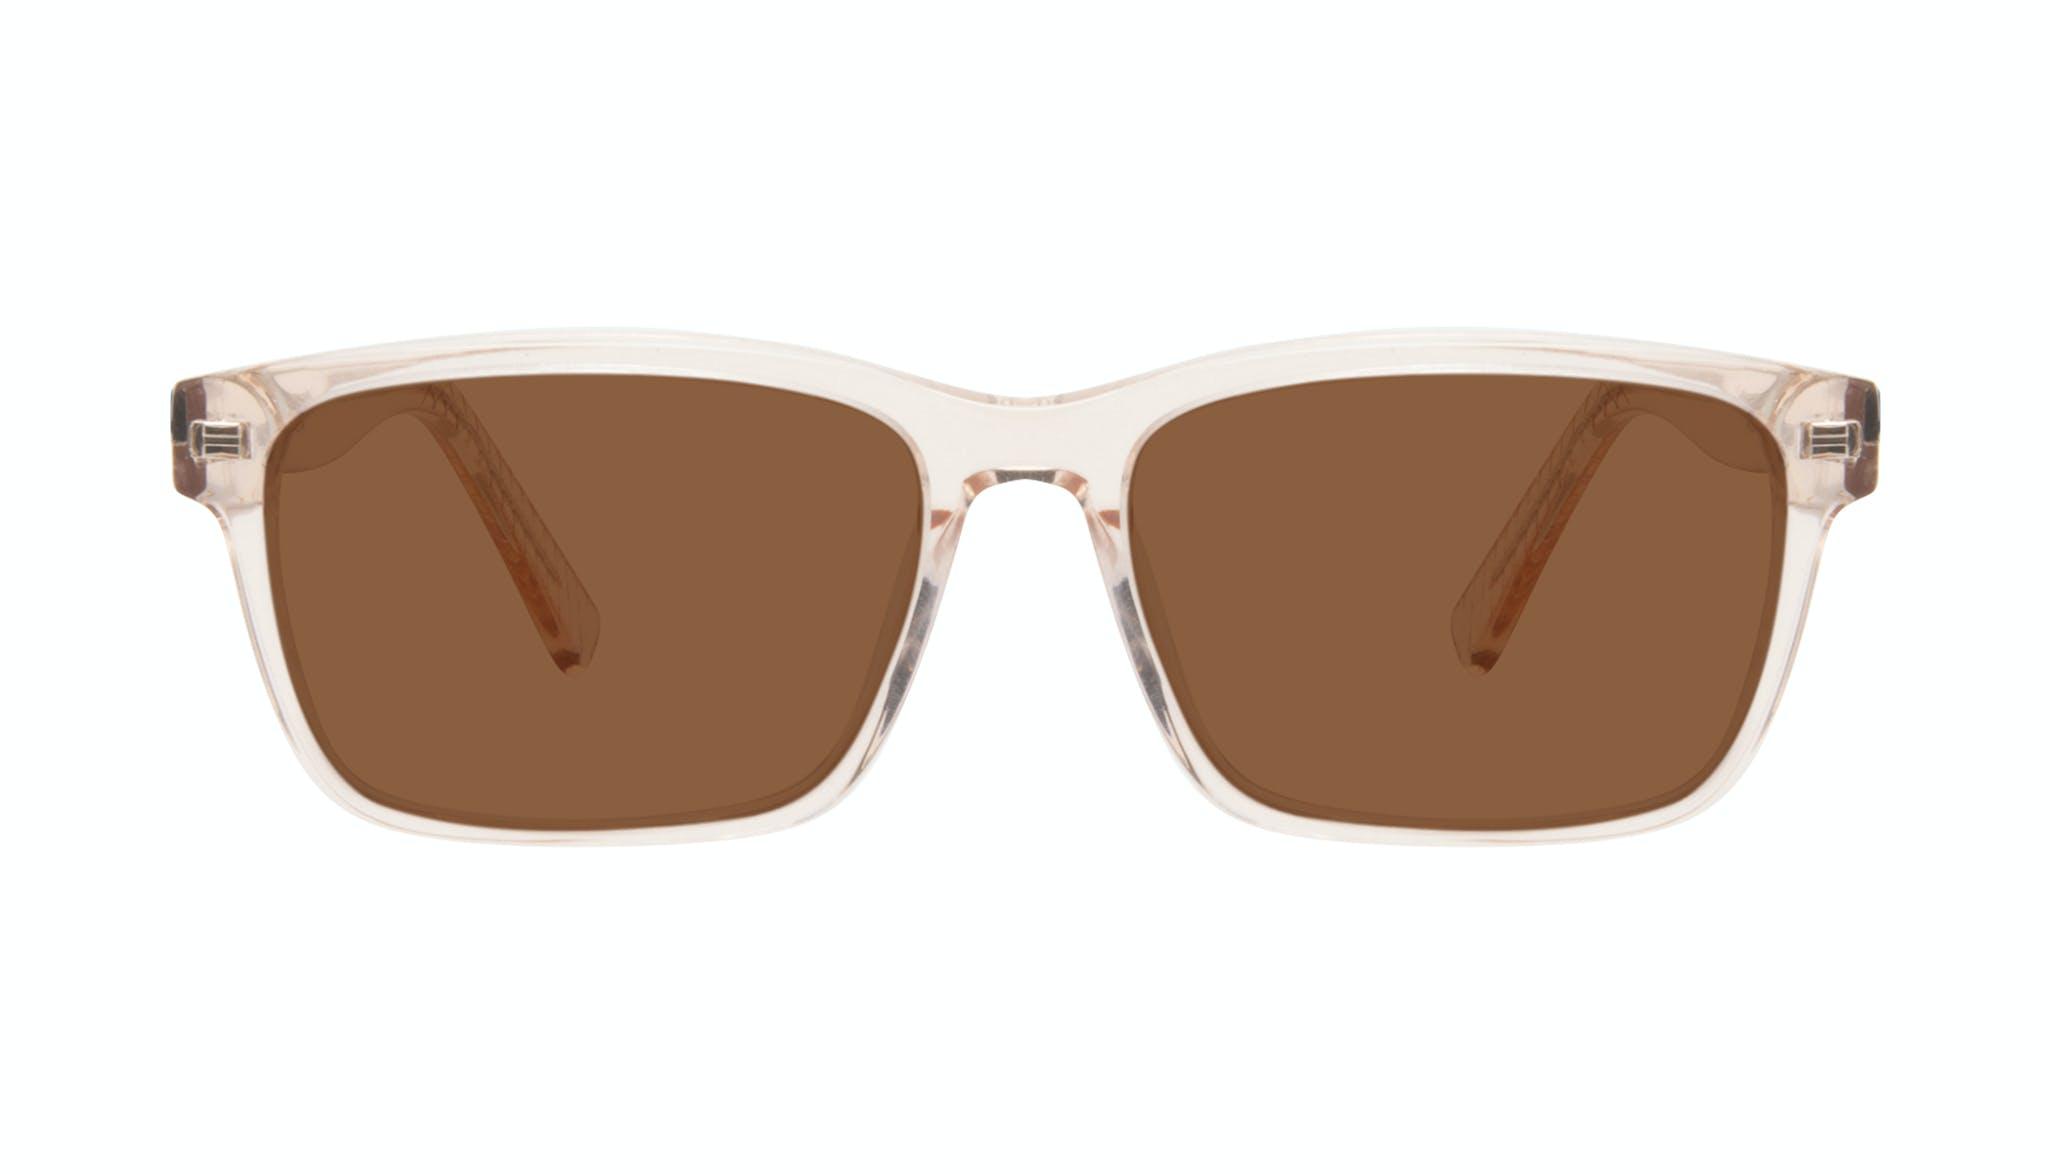 Affordable Fashion Glasses Square Sunglasses Men Chief Golden Front